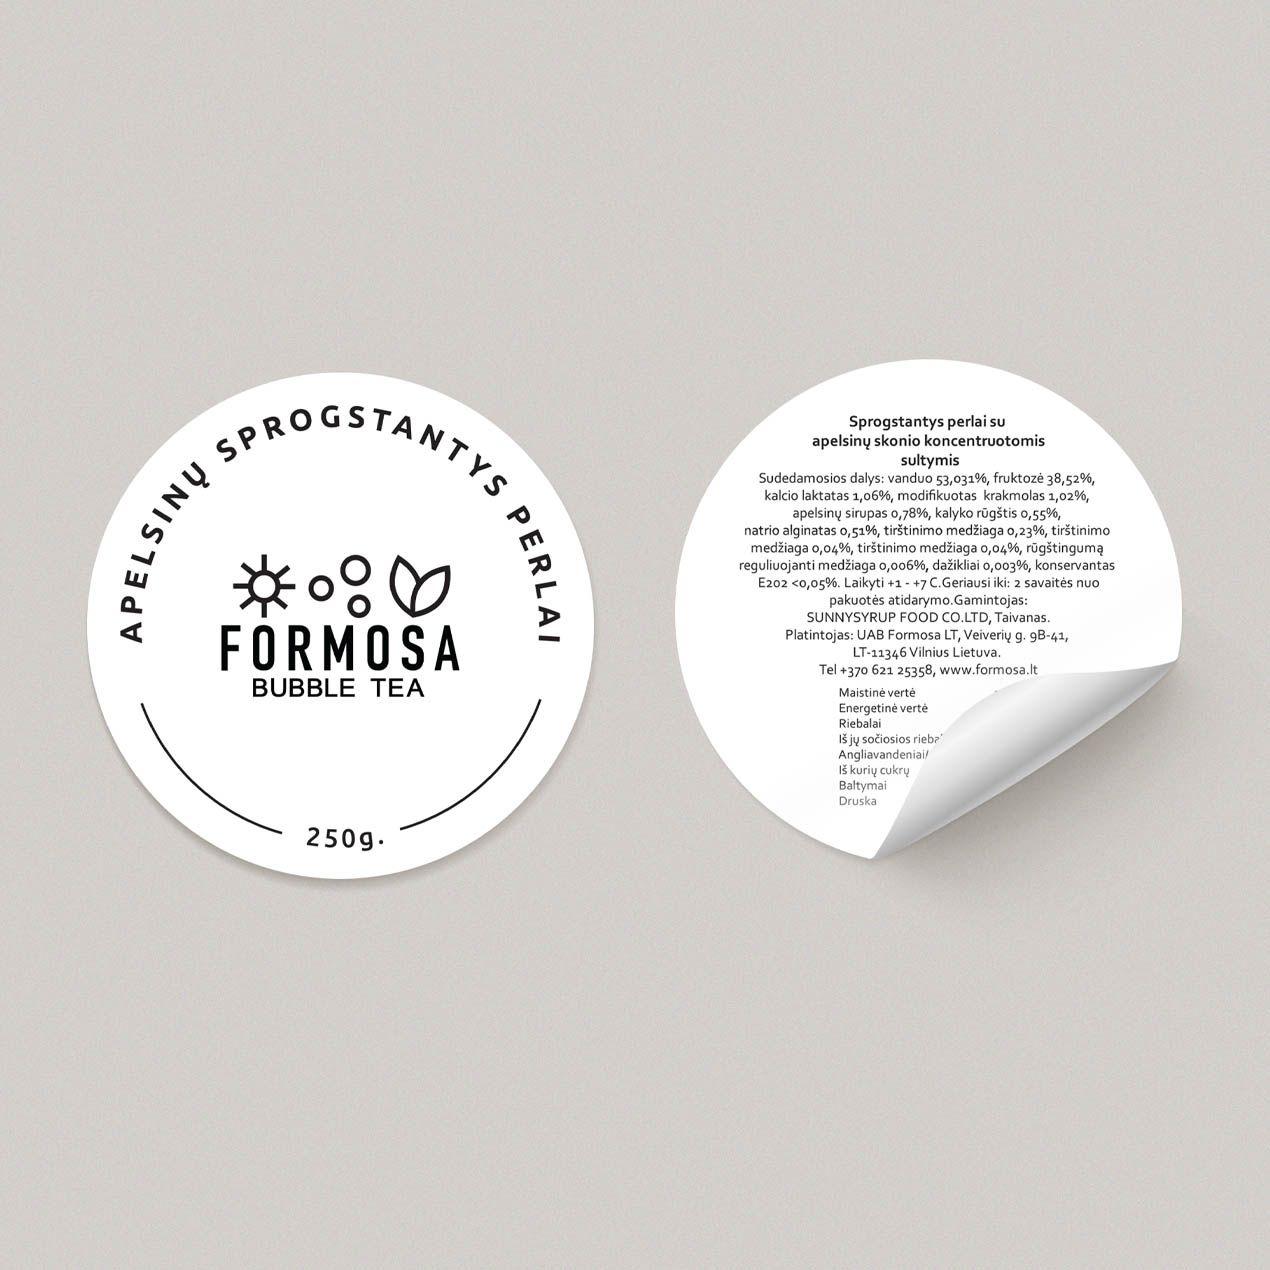 Formosa Bubble Tea Paper Stickers Mockup